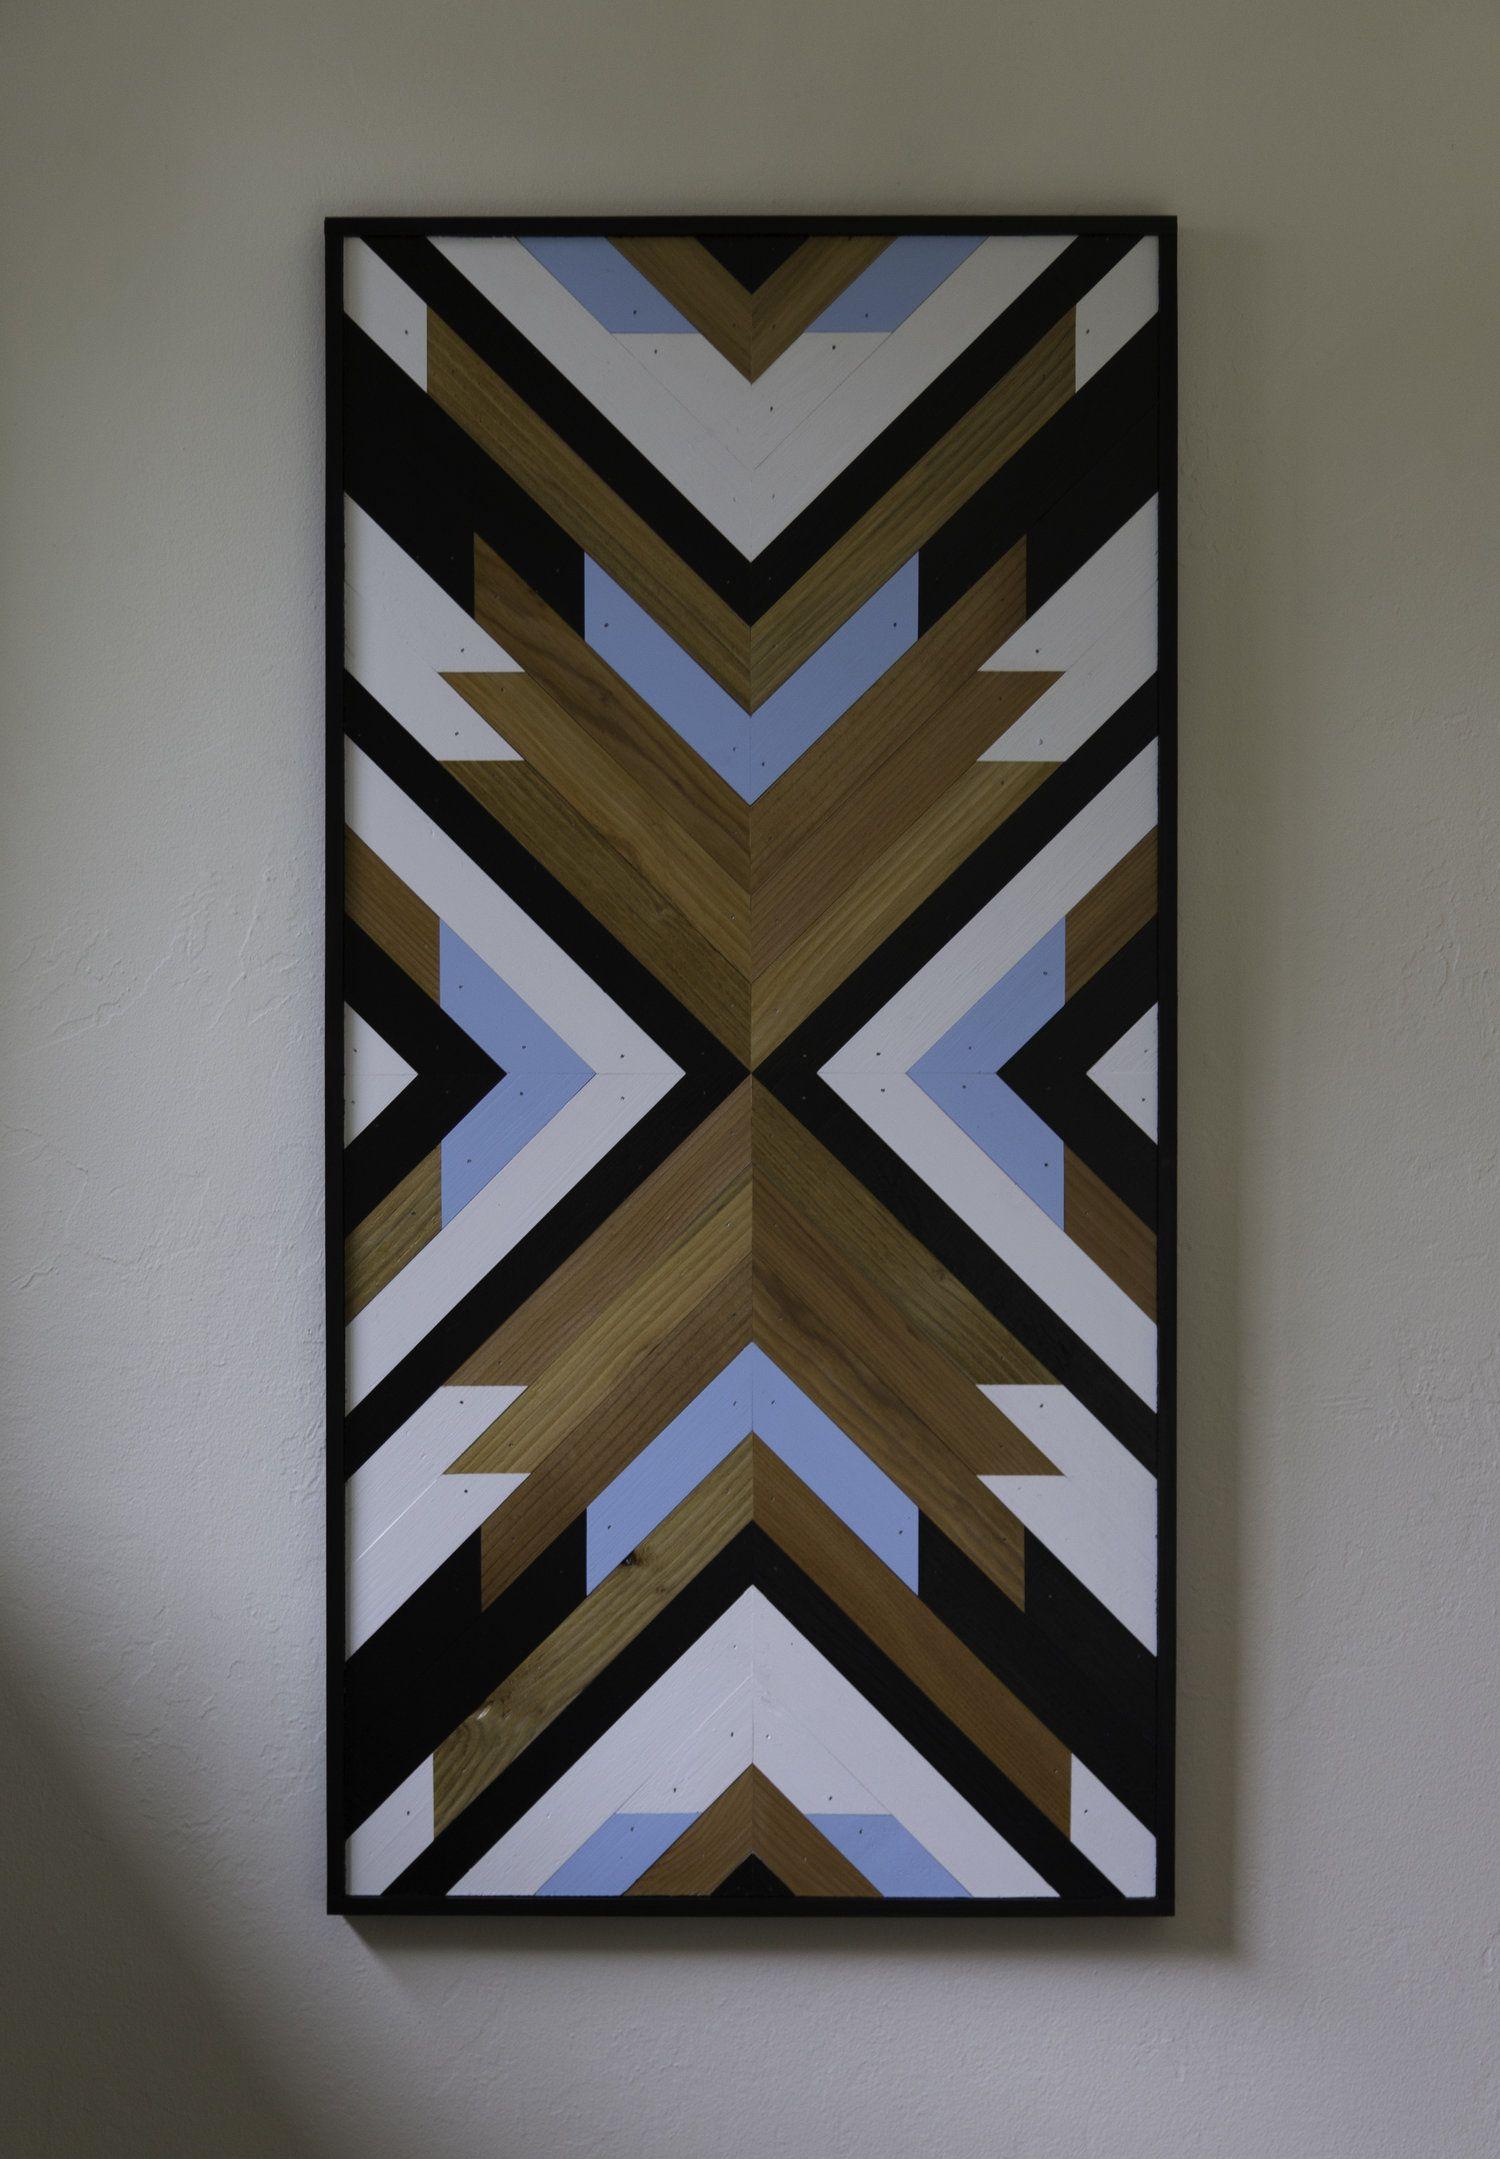 Pin by jillian switzer on art pinterest facebook wood art and woods